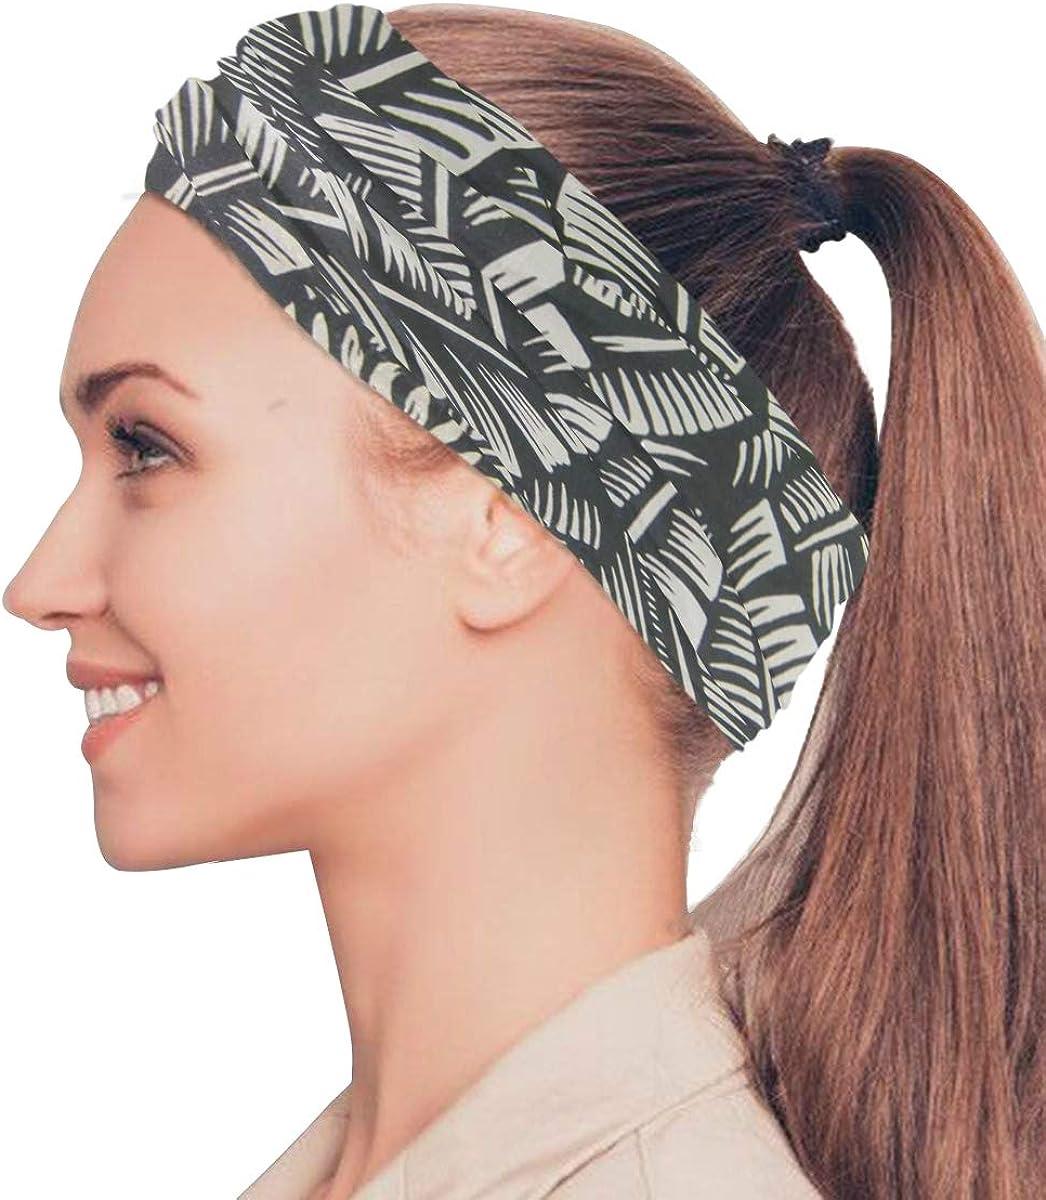 Black And White Art Banana LeavesPrint Headband Face UV Sun Protection Mask Neck Gaiter Magic Scarf Bandana Headwear Balaclava for Women Men